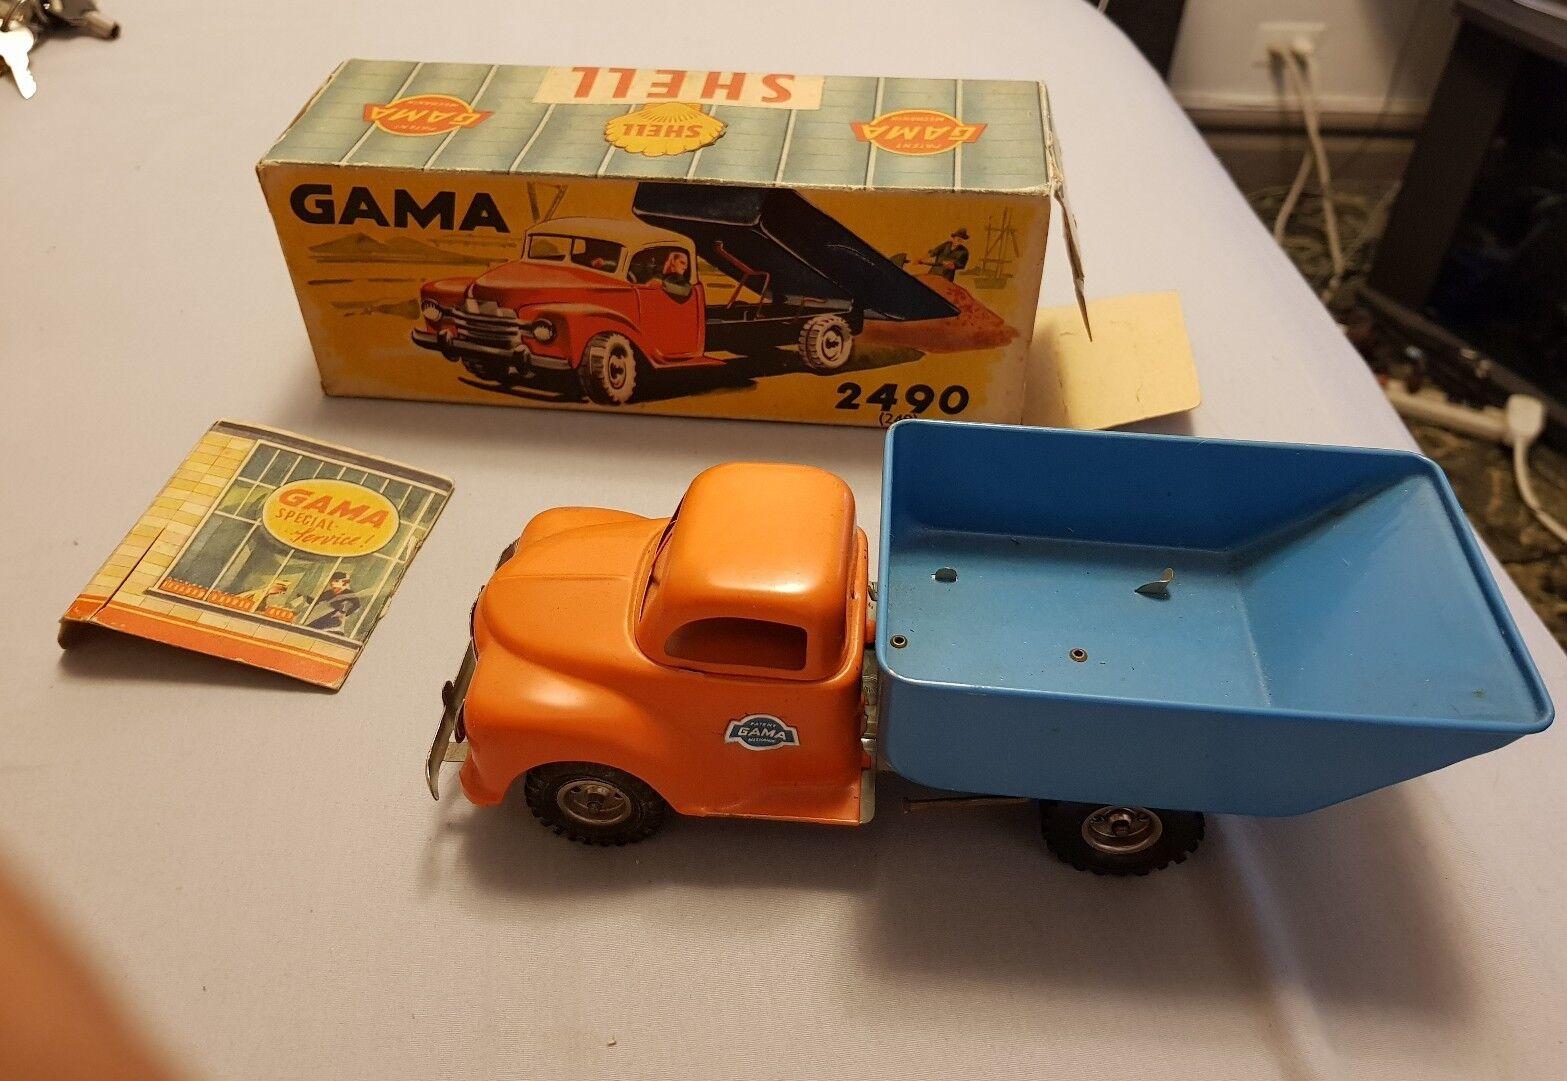 SUPER RARE GAMA  2490 (249) presse Acier mécanique Camion